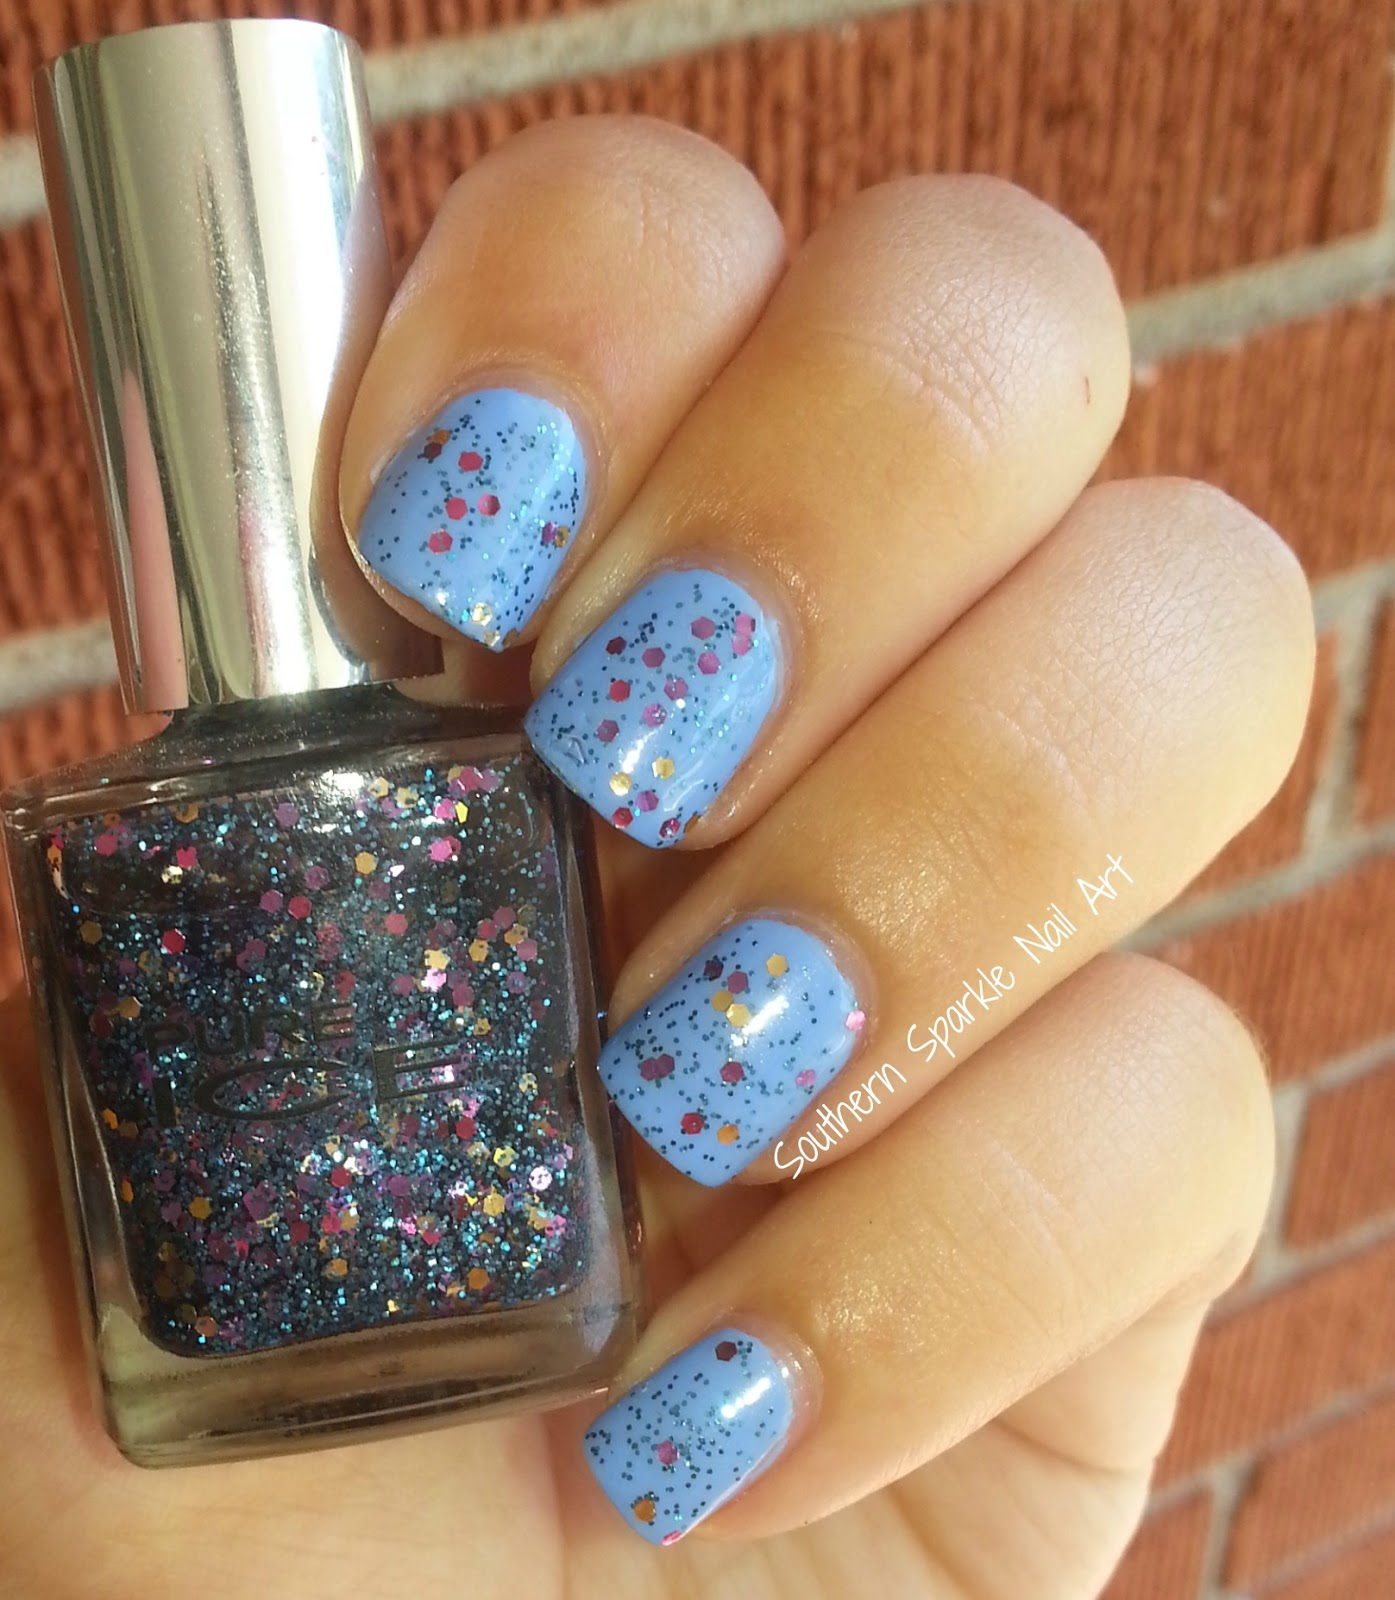 Southern Sparkle Nail Art: June 2014